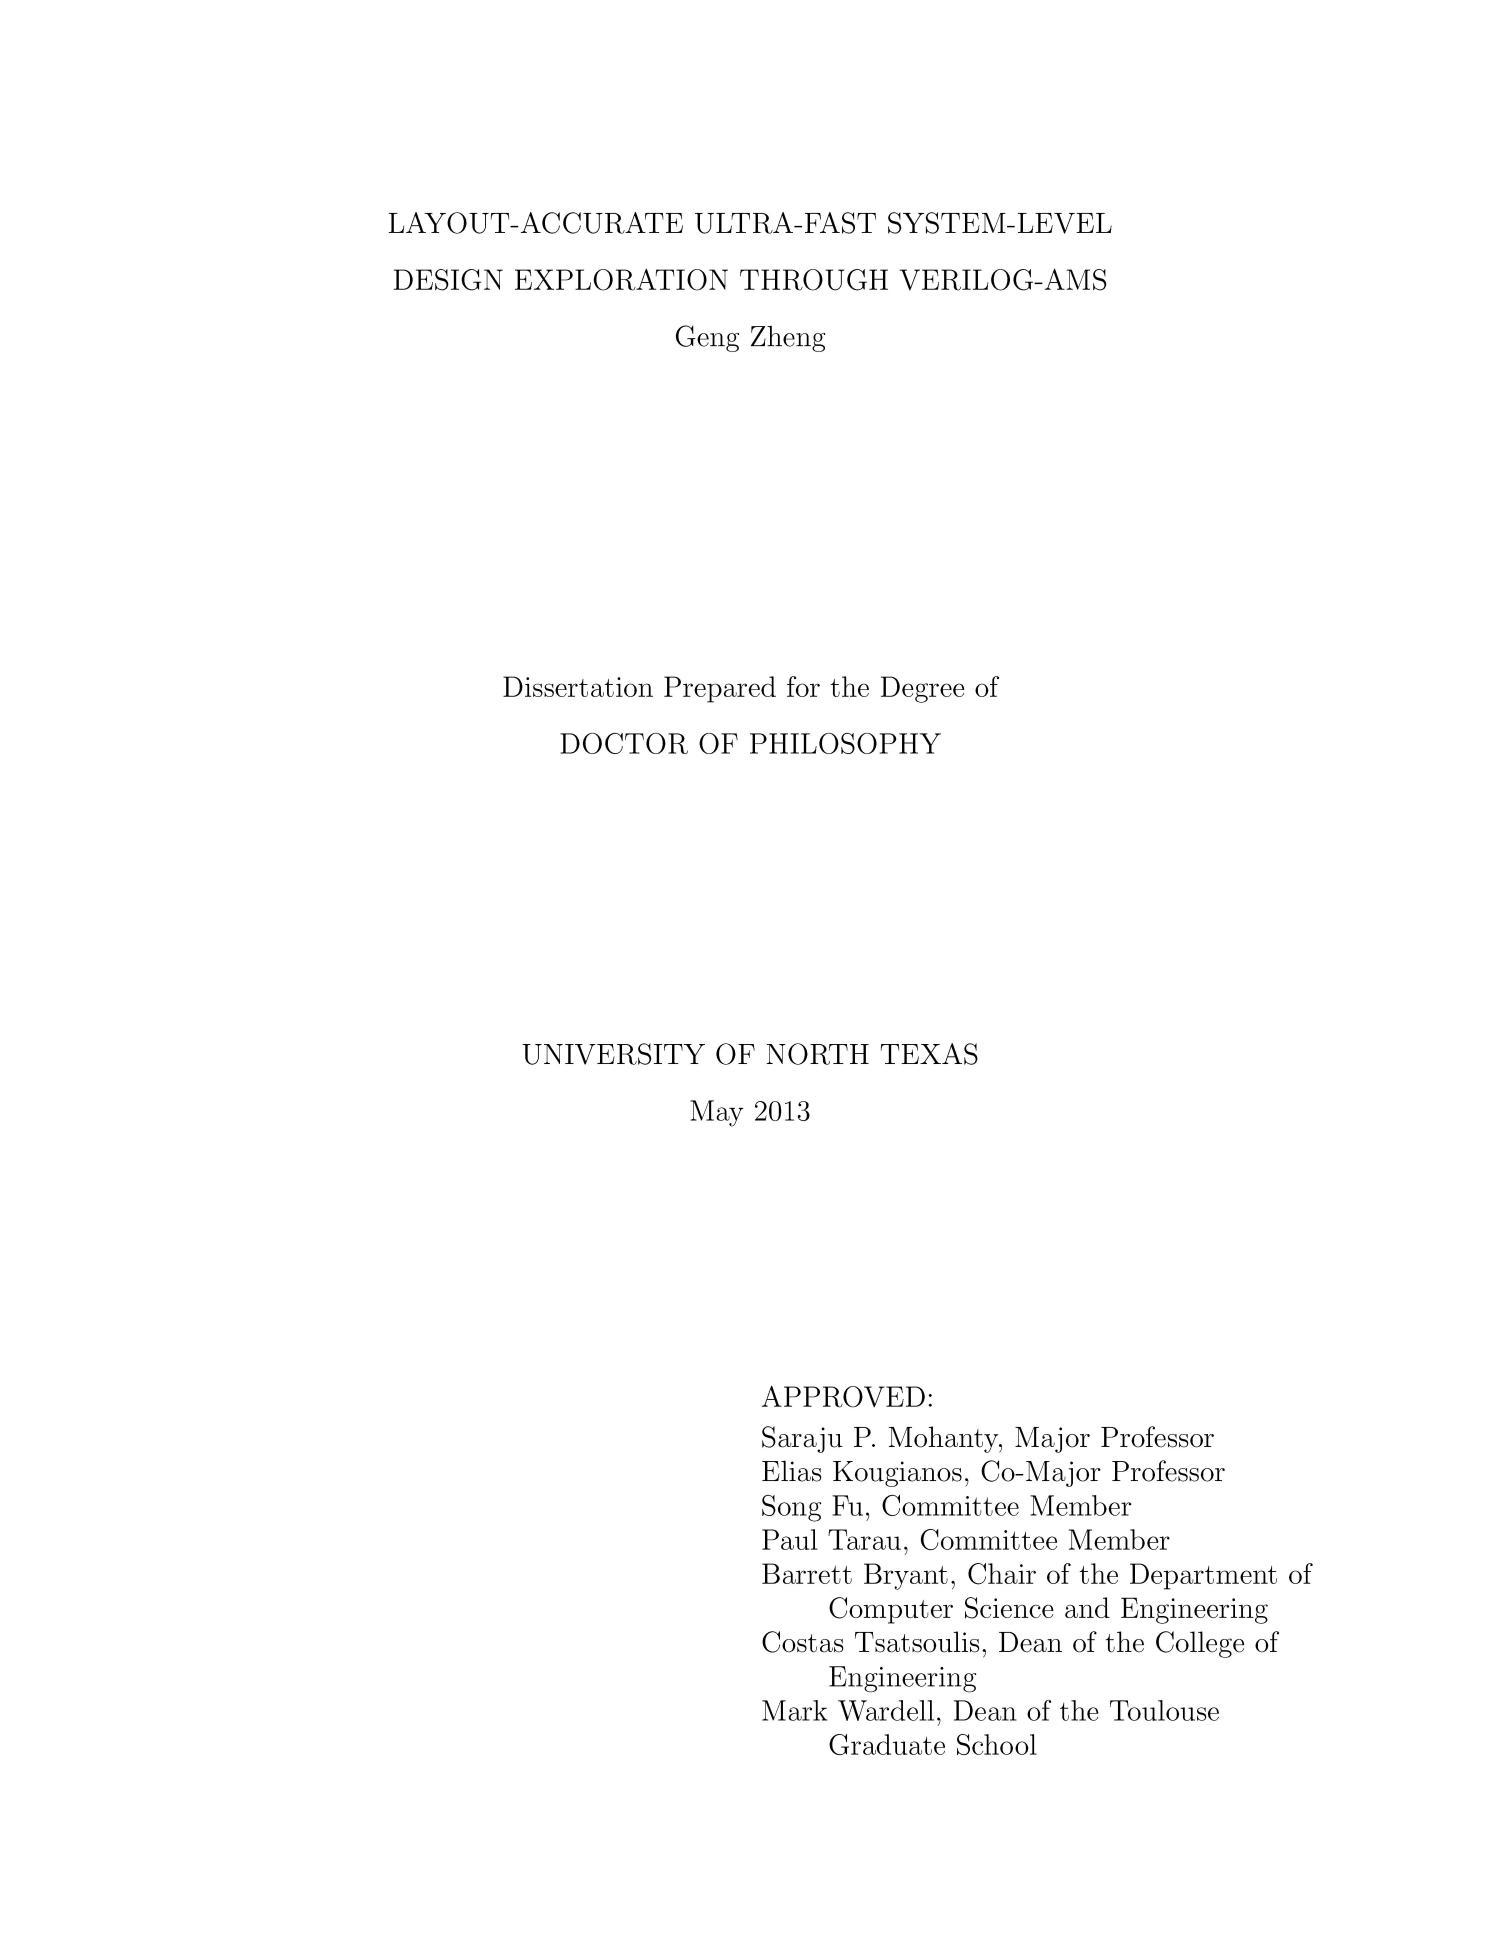 Phd english creative writing dissertation